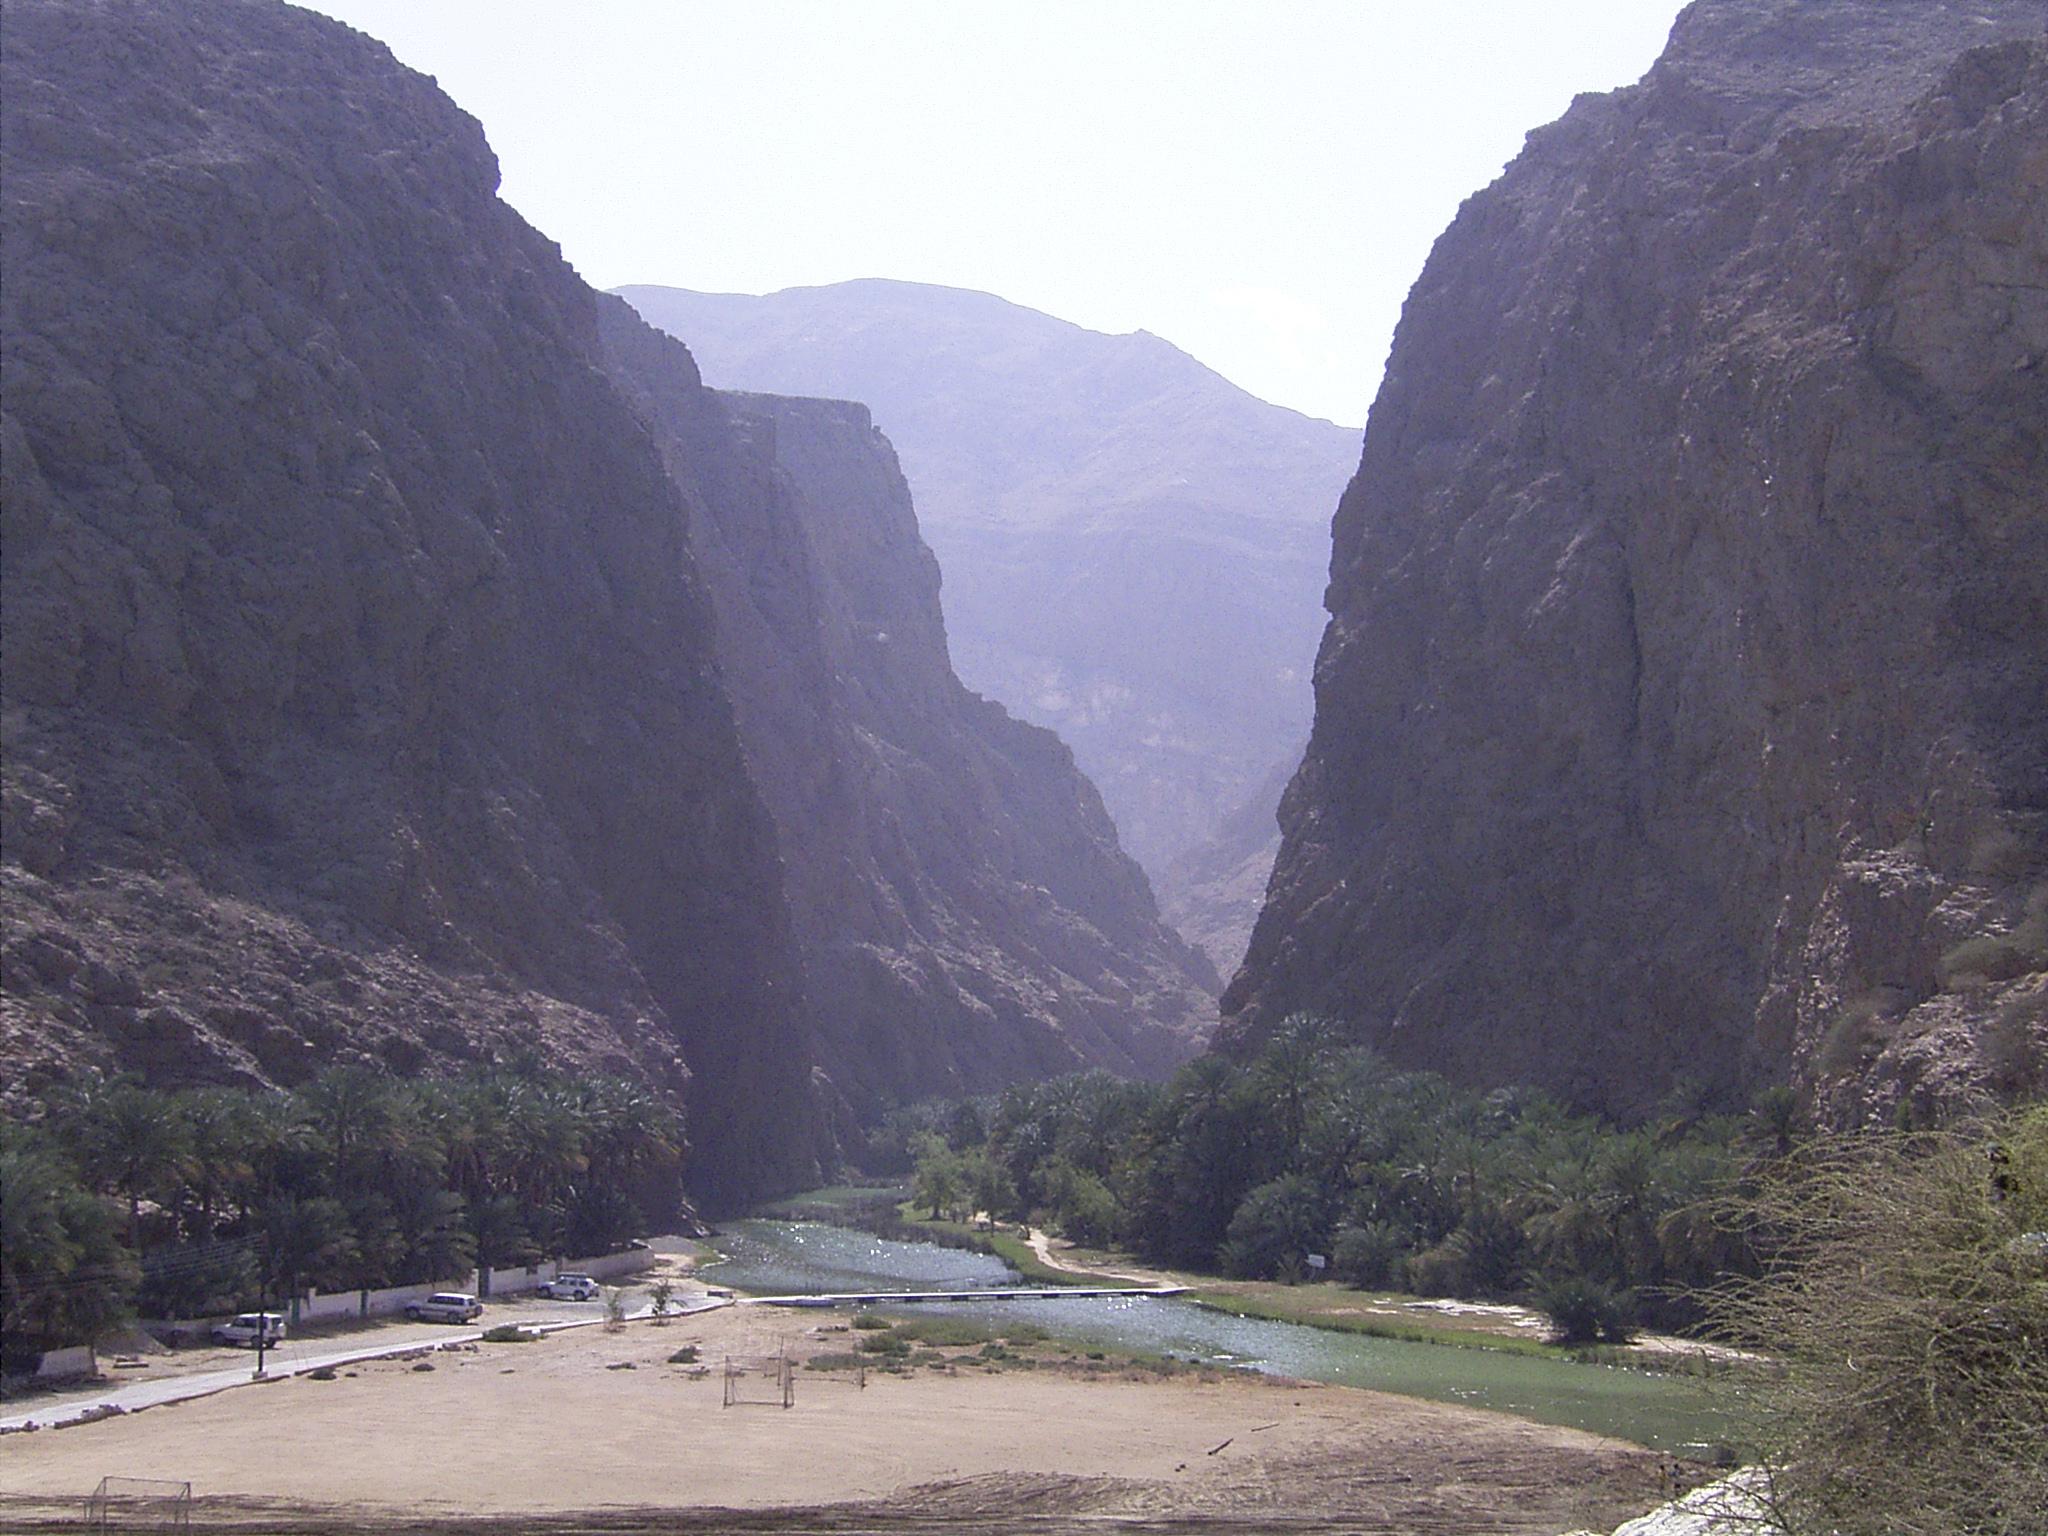 Wadi - Simple English Wikipedia, the free encyclopedia